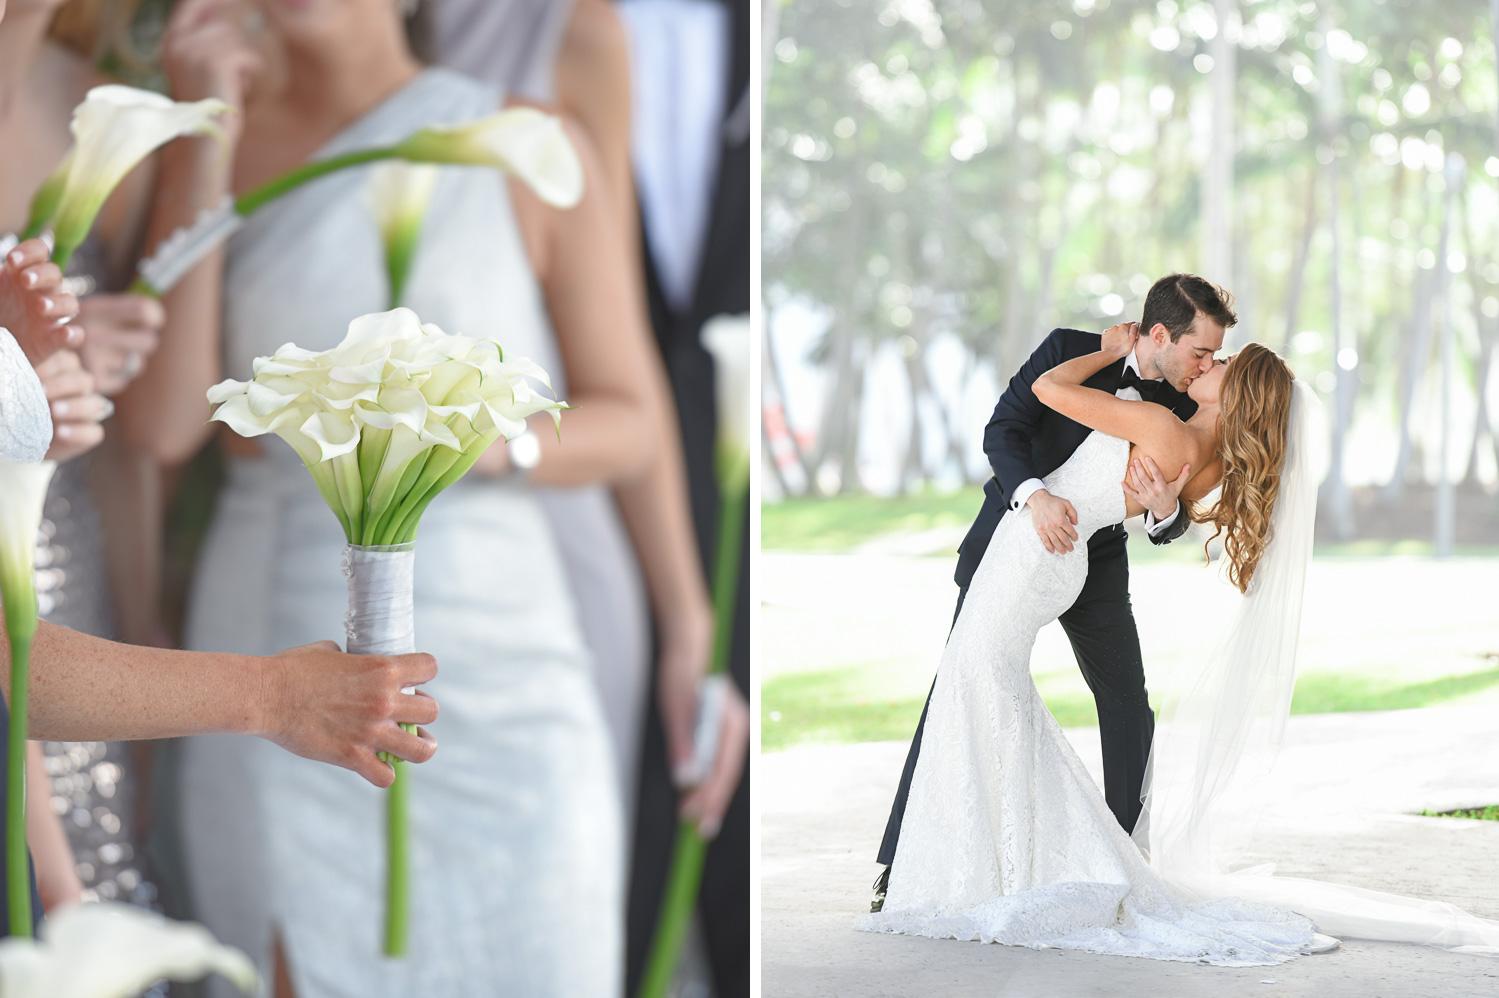 bride and groom at Tropical Luxury Wedding at Temple Emmanu-El in Miami Beach